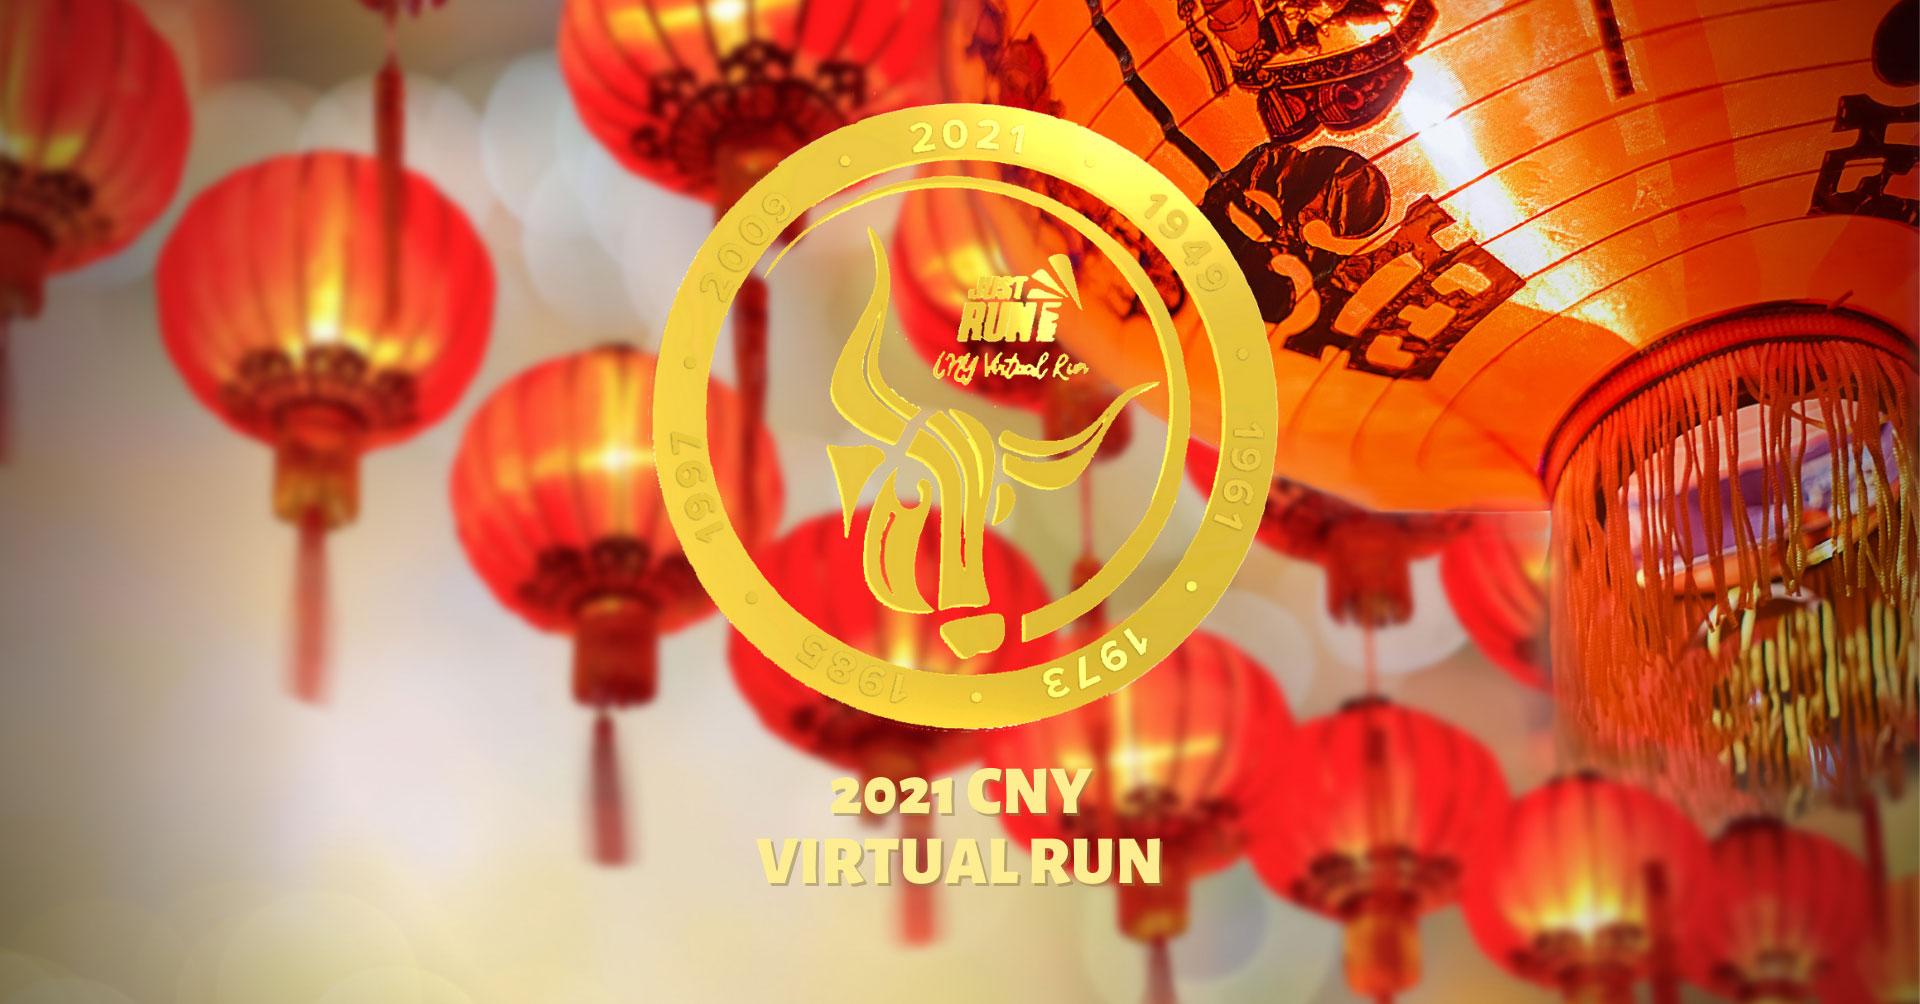 Logo of 2021 JRL CNY Virtual Re-Run